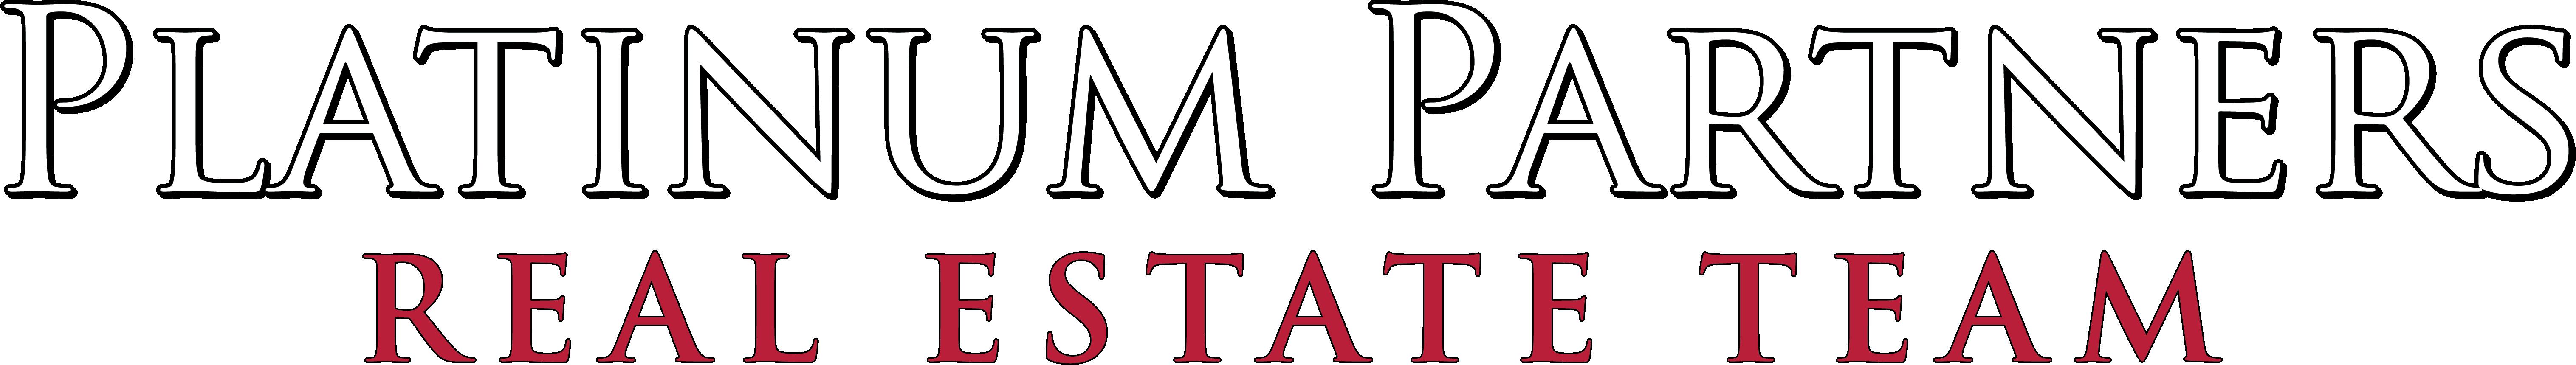 Platinum Partners Real Estate Team logo